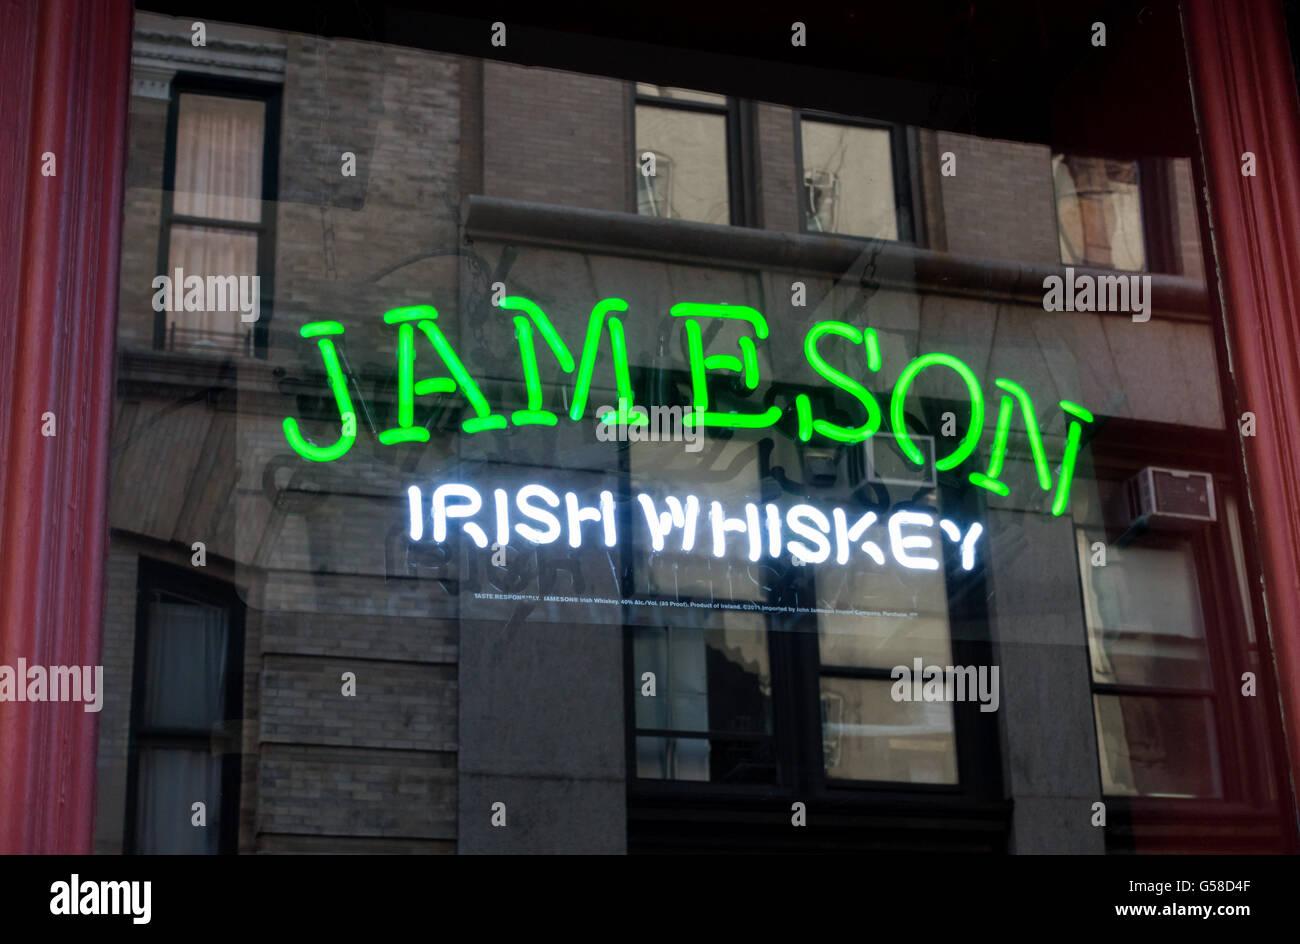 Jameson Irish Whiskey neon sign in a window of New York